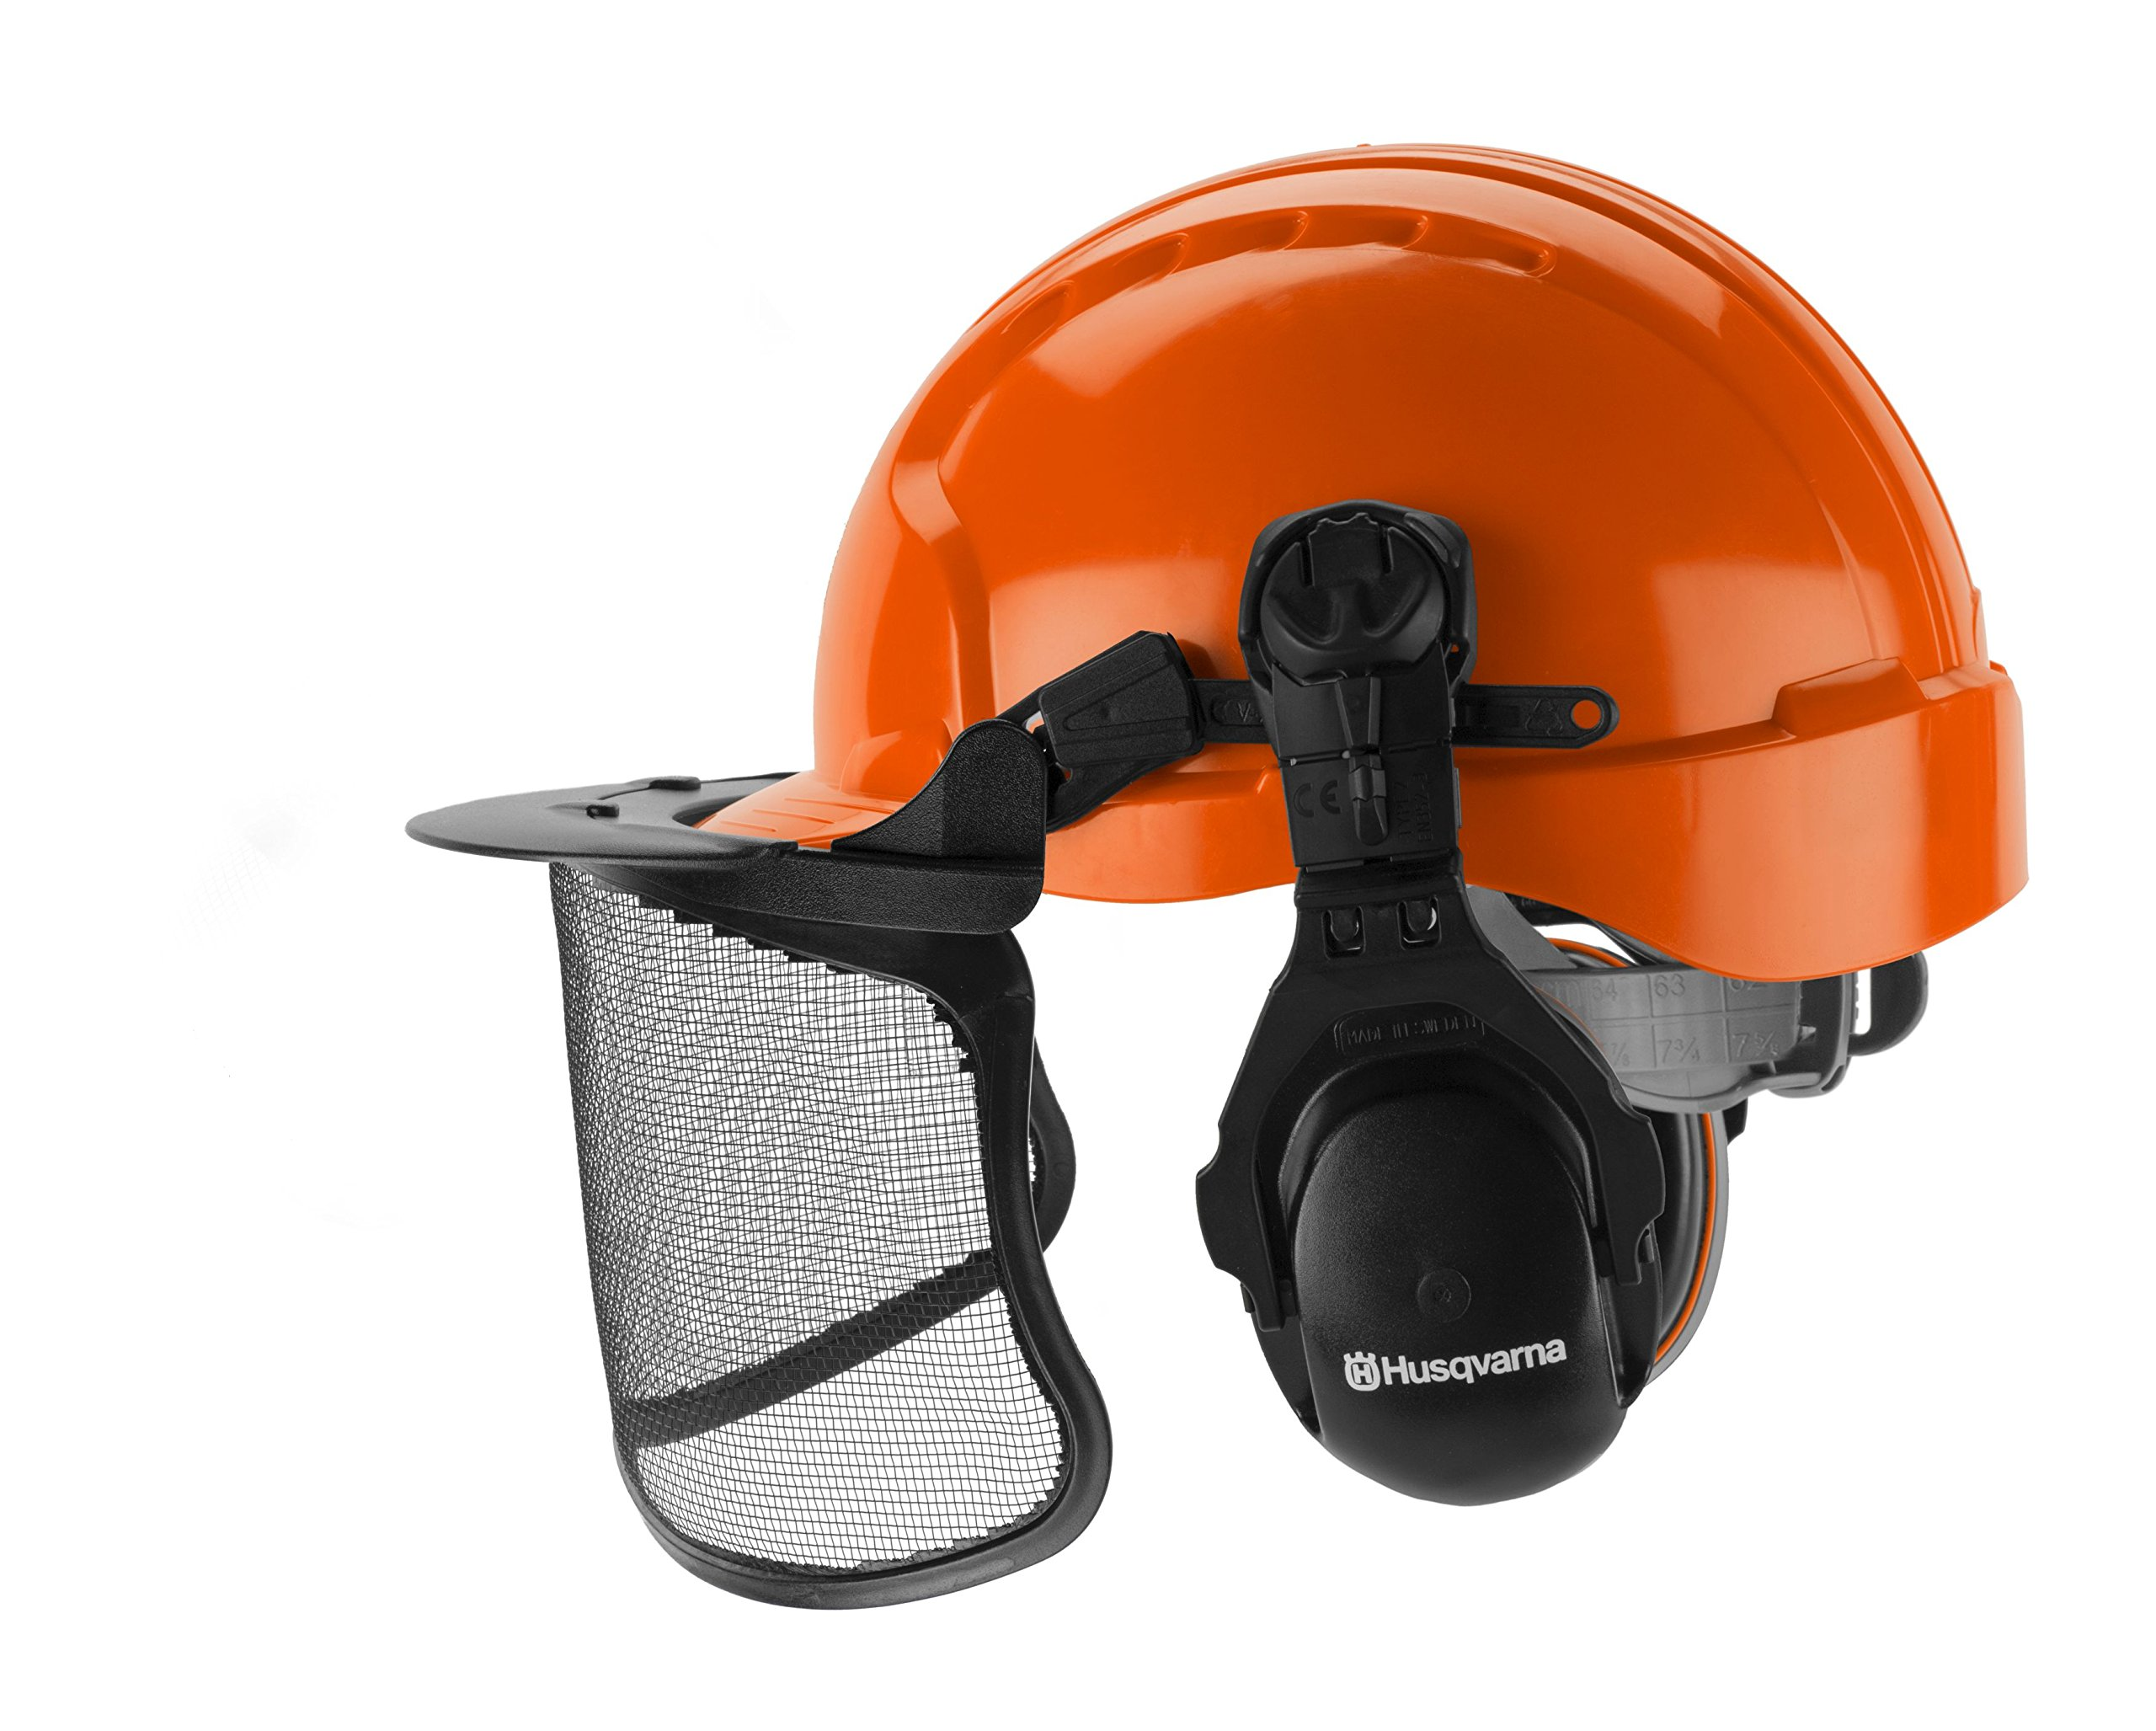 Husqvarna 592752601 Forest Head Protection Helmet by Husqvarna (Image #3)